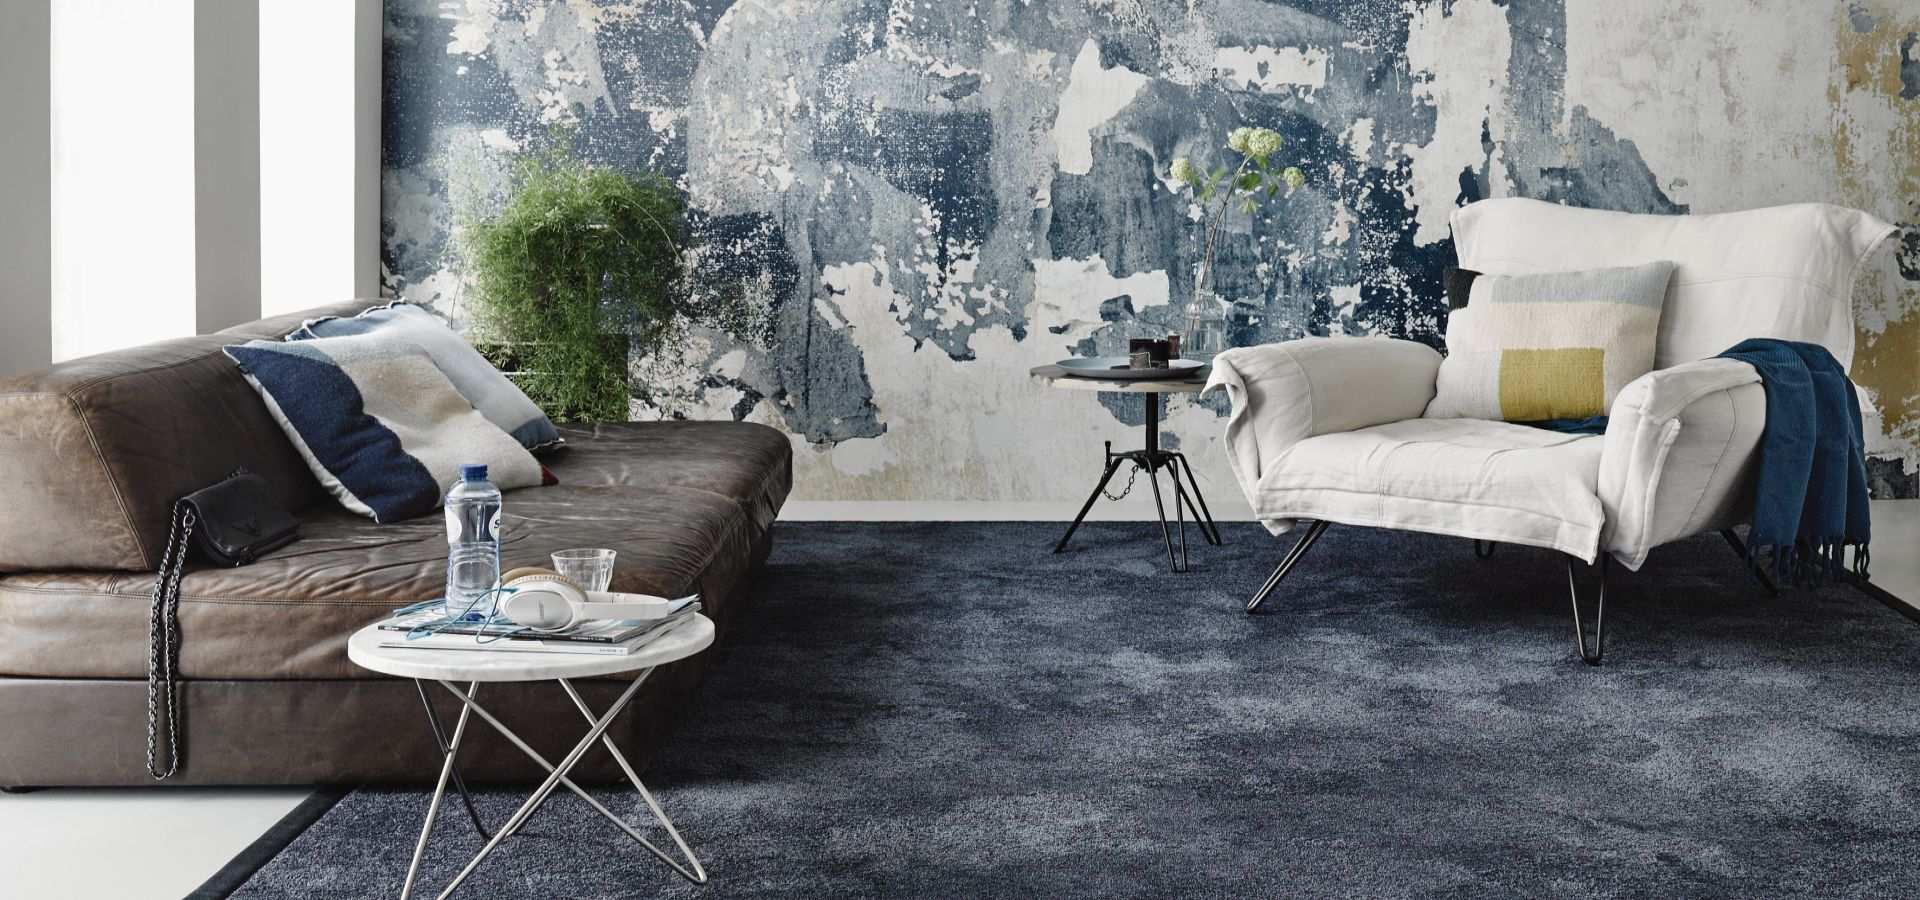 Wohnzimmer Teppichboden Soft Touch lila batik